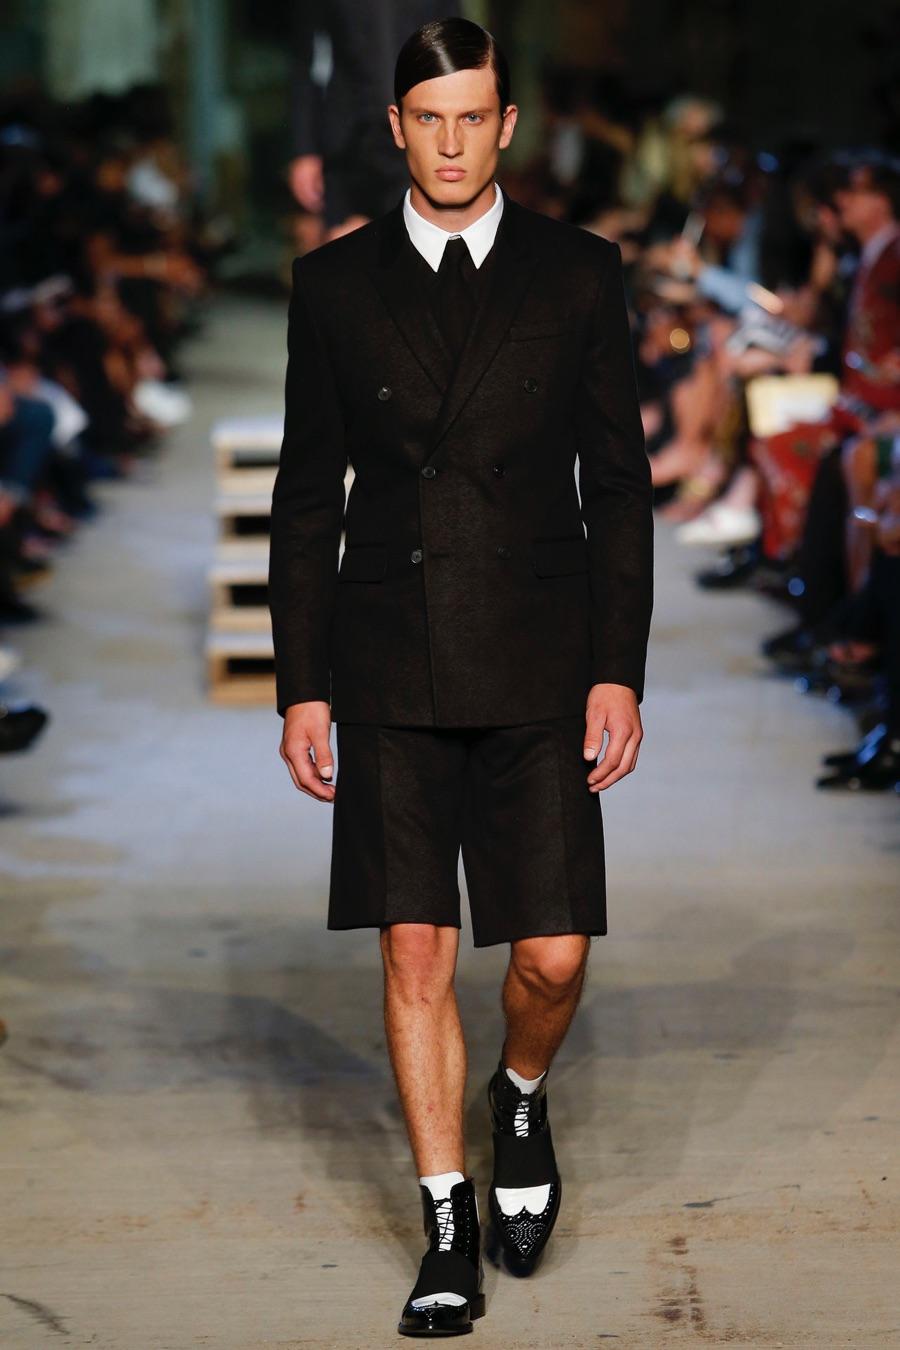 Givenchy-Spring-Summer-2016-Menswear-Collection-New-York-Fashion-Week-004.jpg